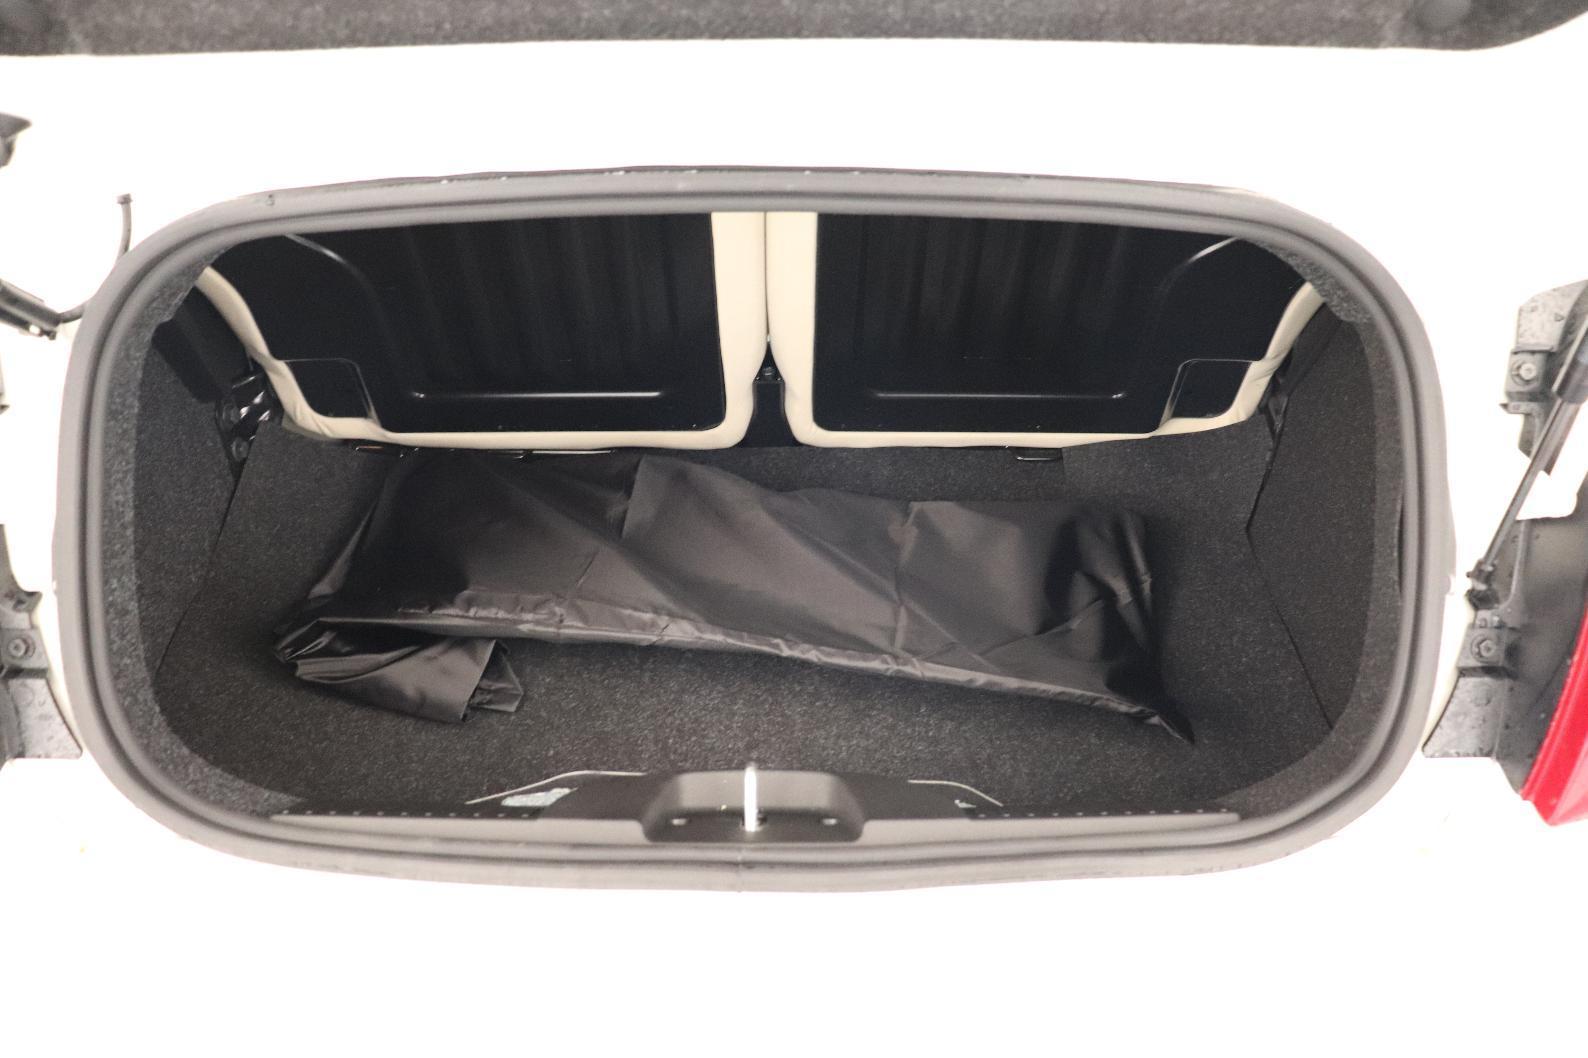 FIAT 500C Serie 8 EURO 6d-temp 500C 1.0 70 ch Hybride BSG S/S Dolcevita Hybrid